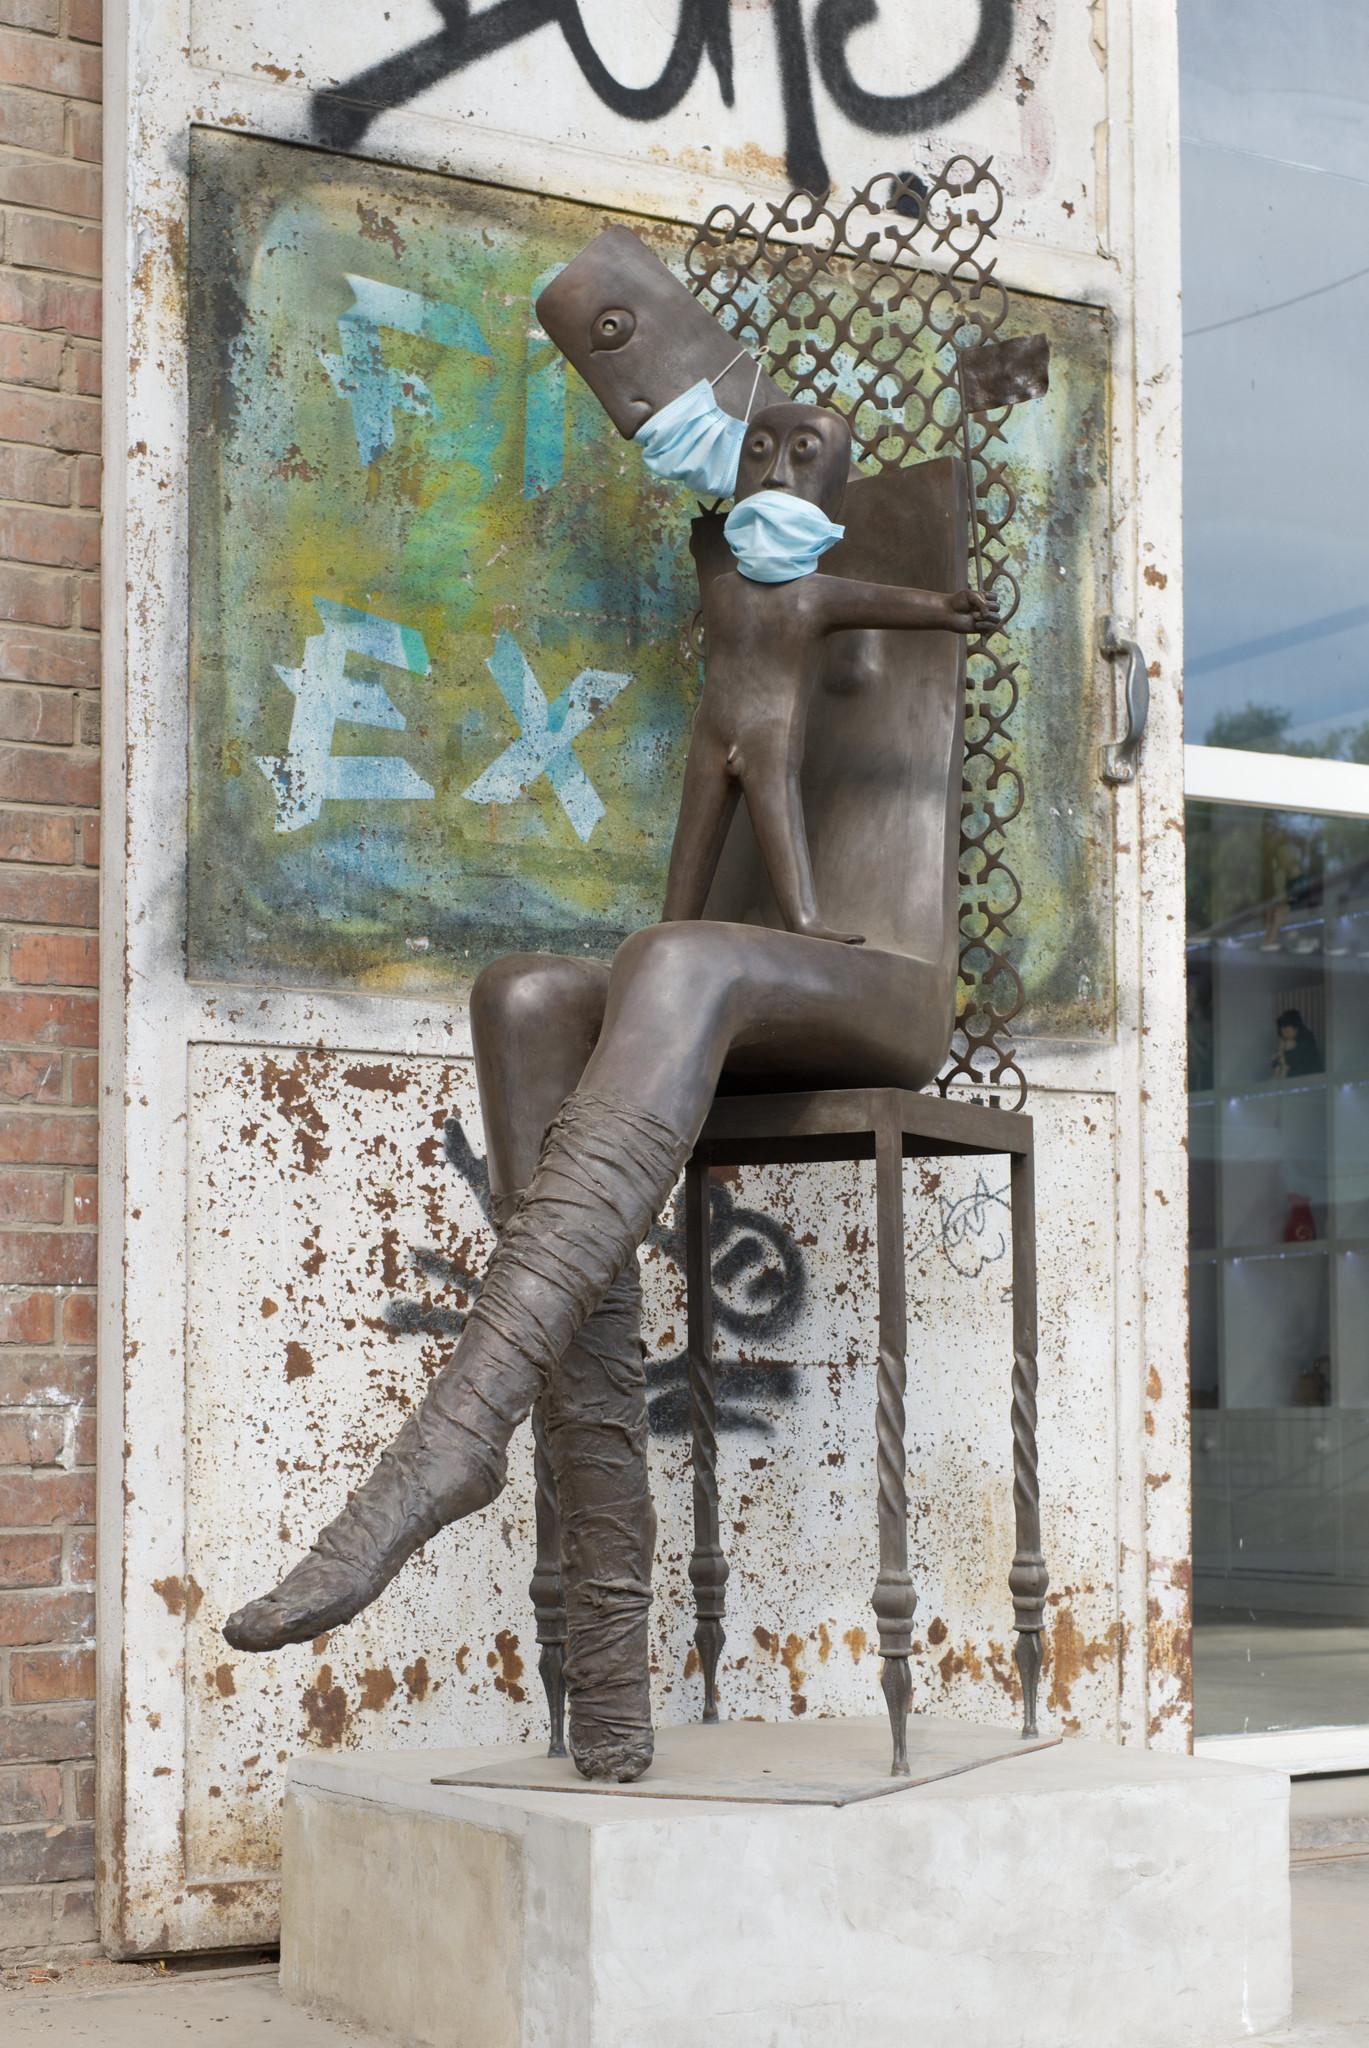 798 skulptur maske